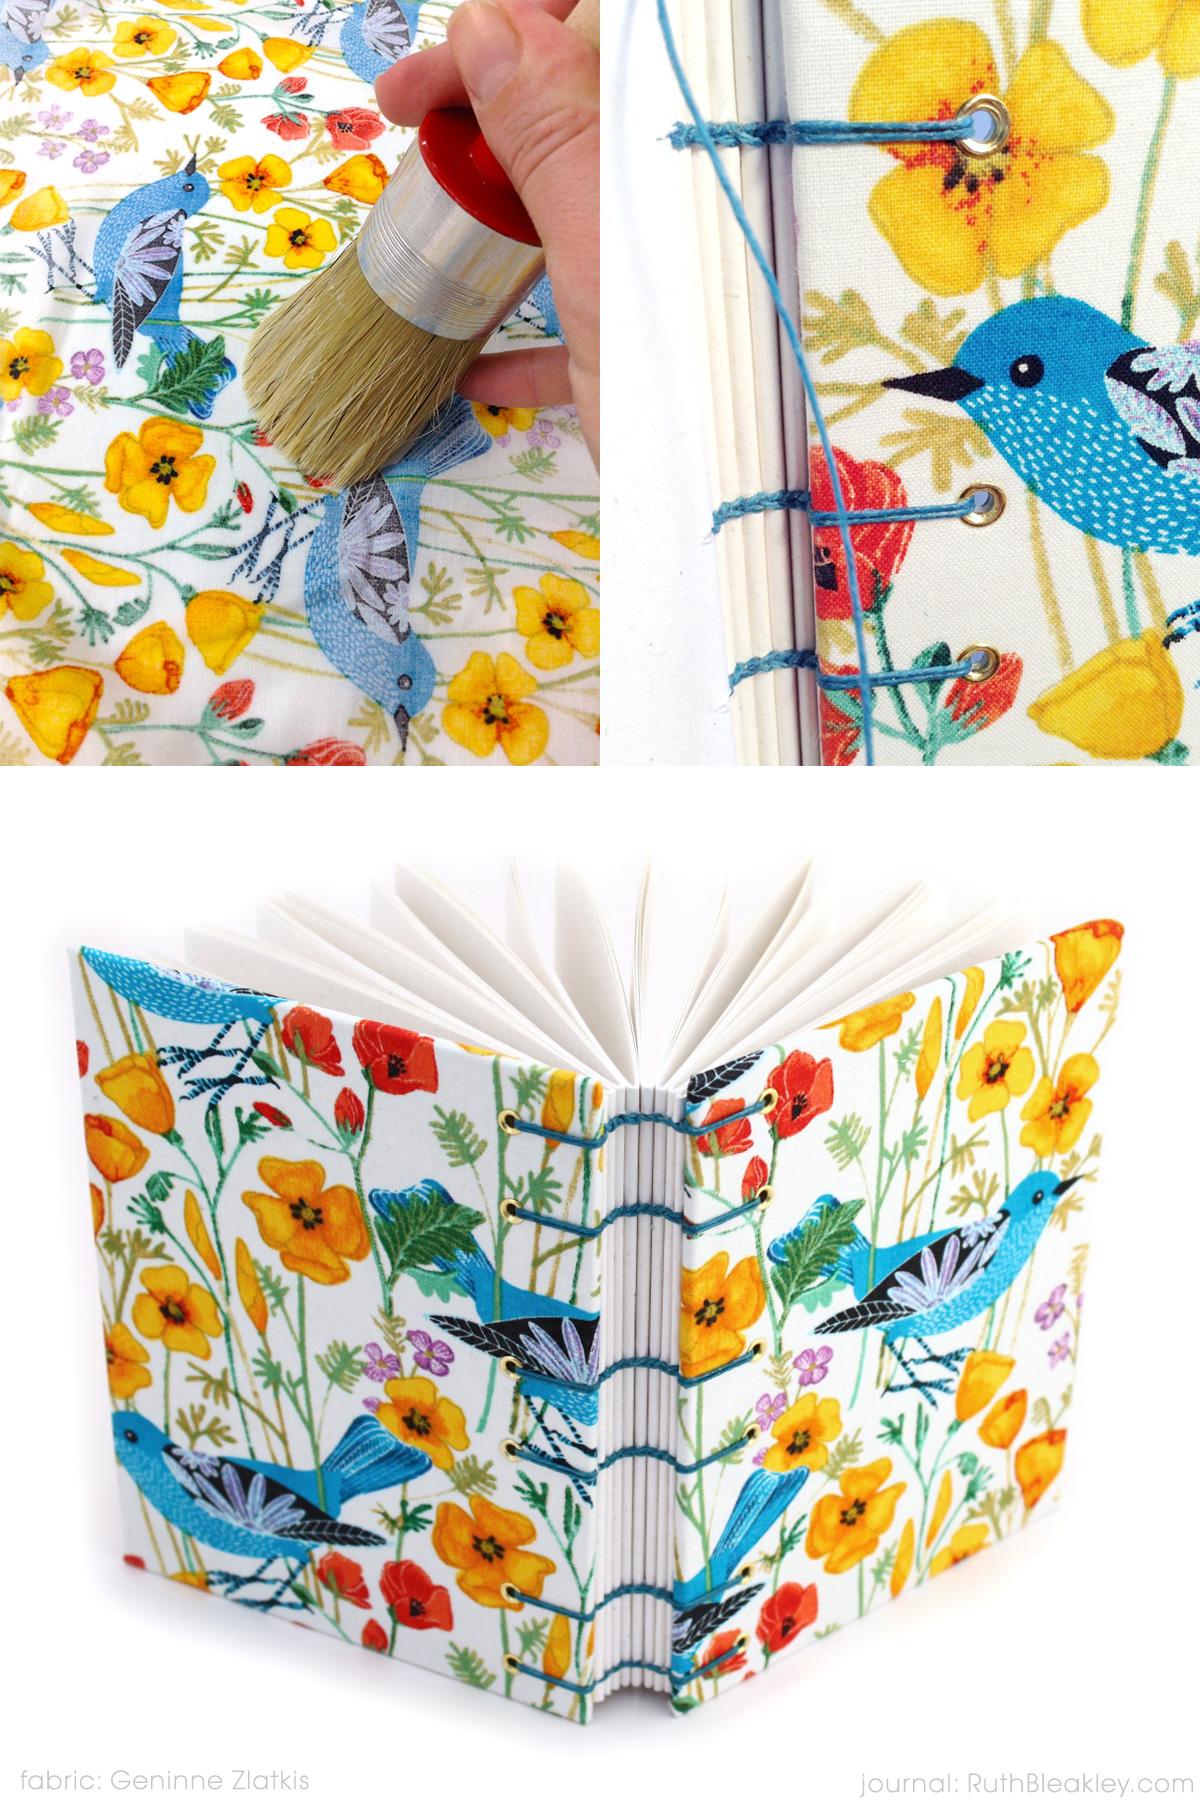 Bluebird Journal handmade by Ruth Bleakley with Geninne Zlatkis fabric